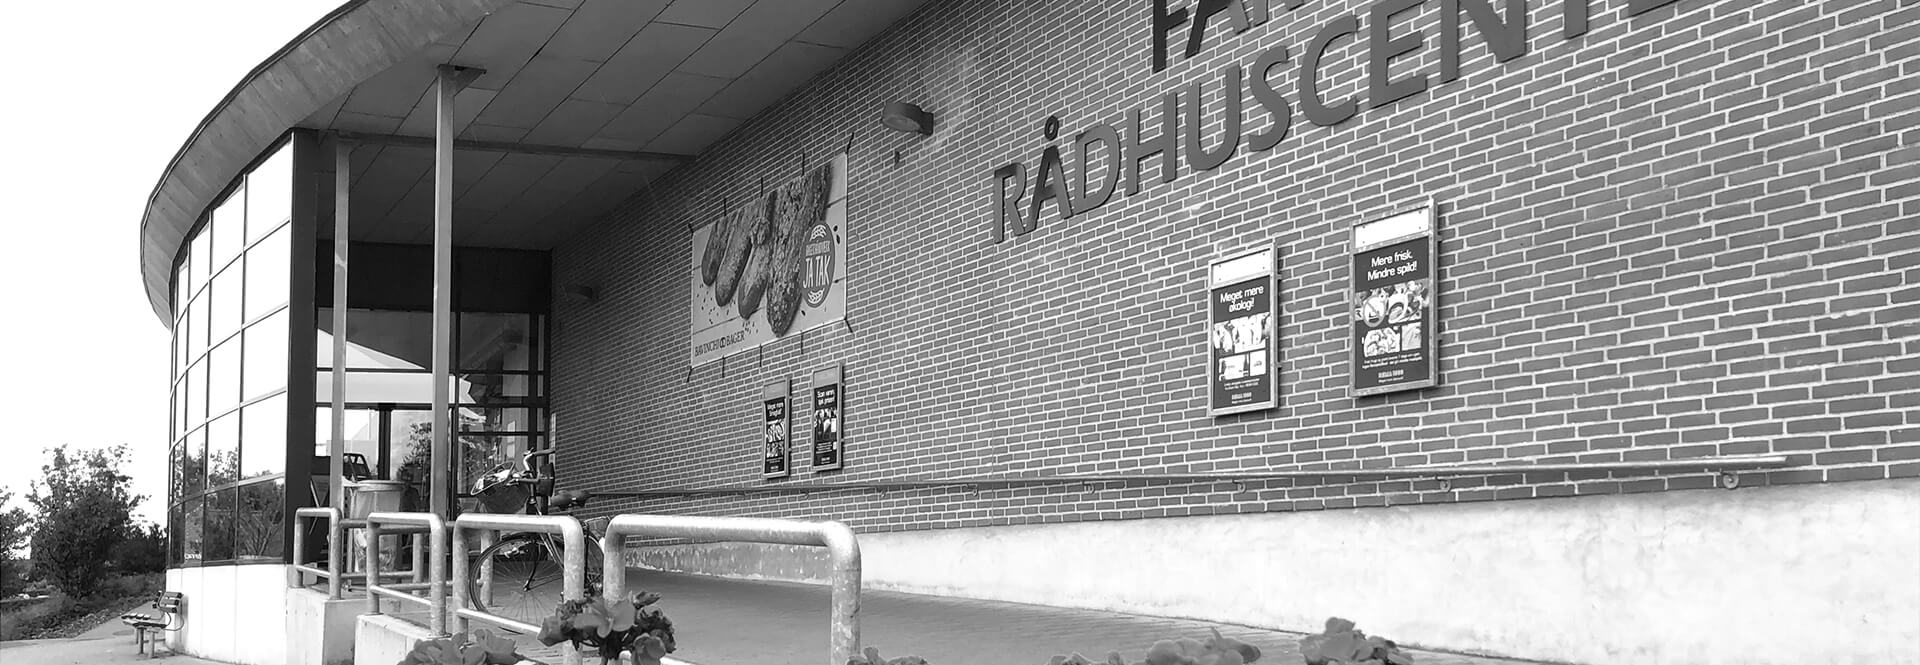 Farsø Rådhuscenter adresse